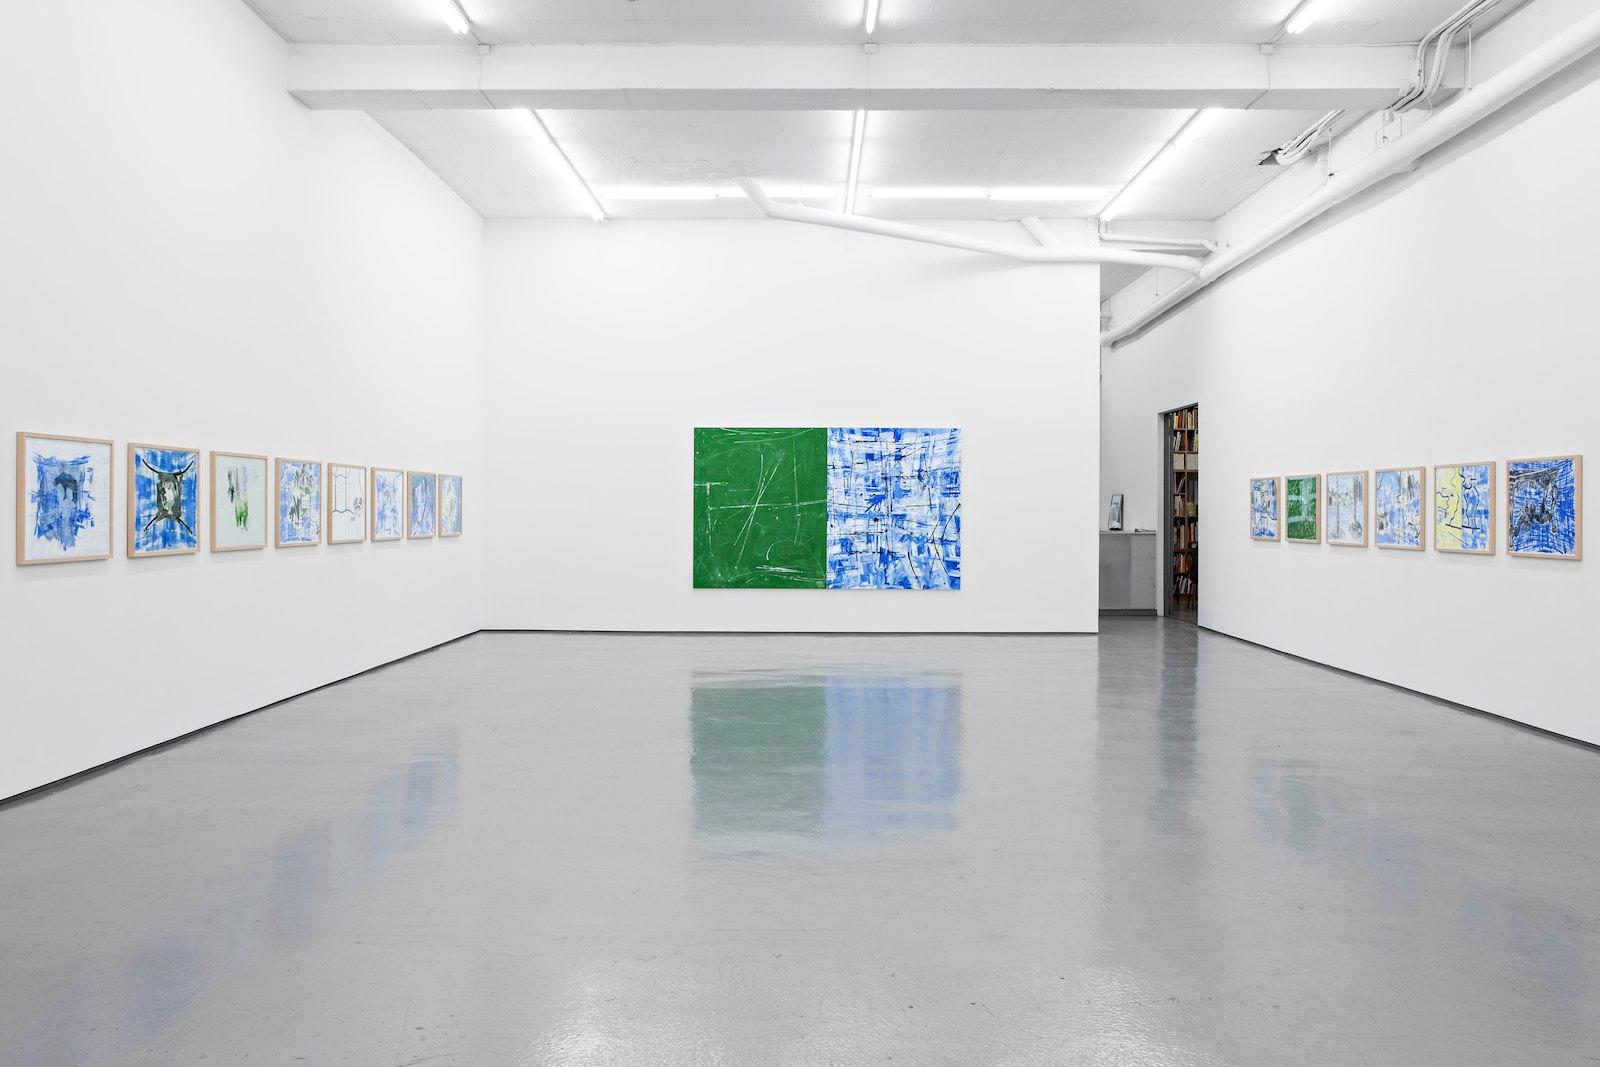 Installation view, Troels Wörsel, Makulatur, Galleri Riis, Oslo, 2013